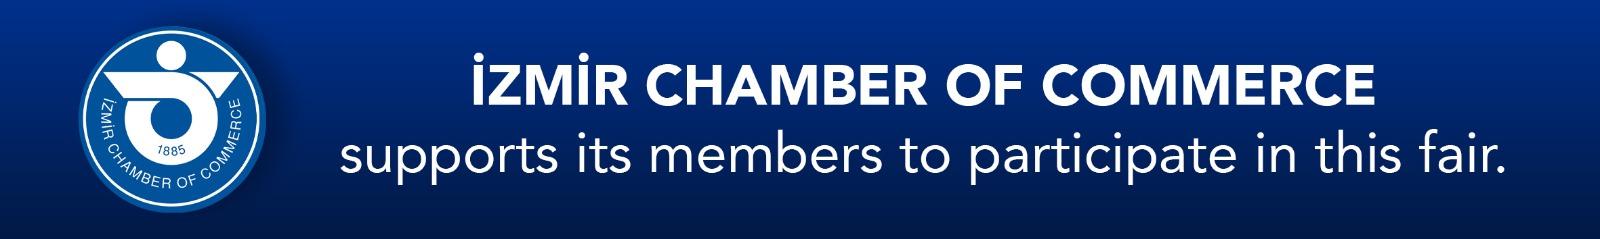 İzmir Chamber of Commerce